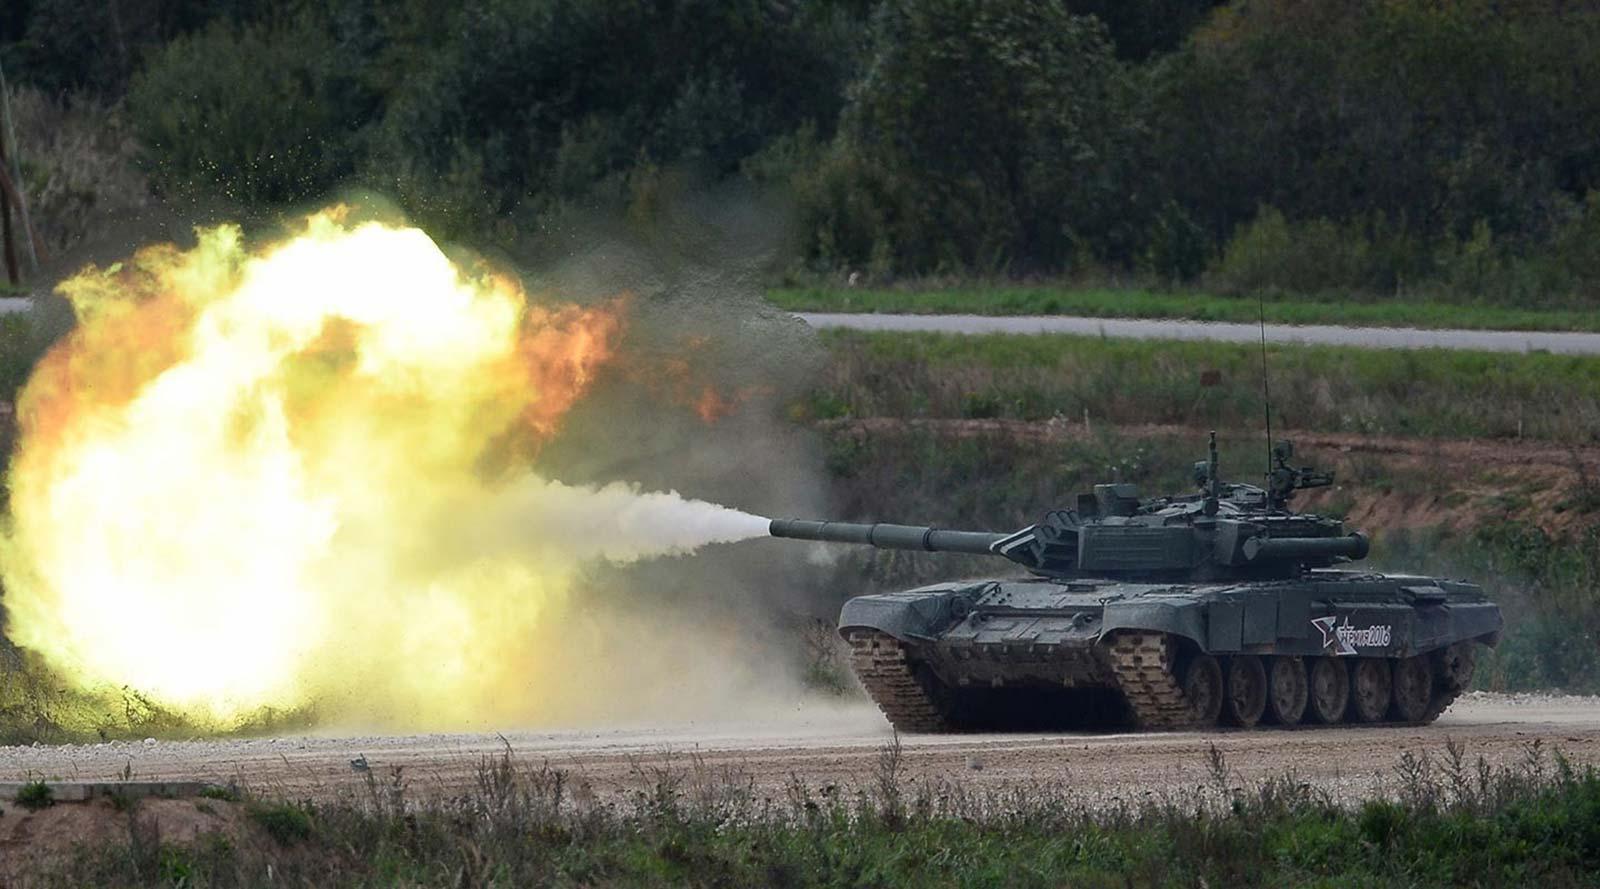 Russian Army T-90 Tank